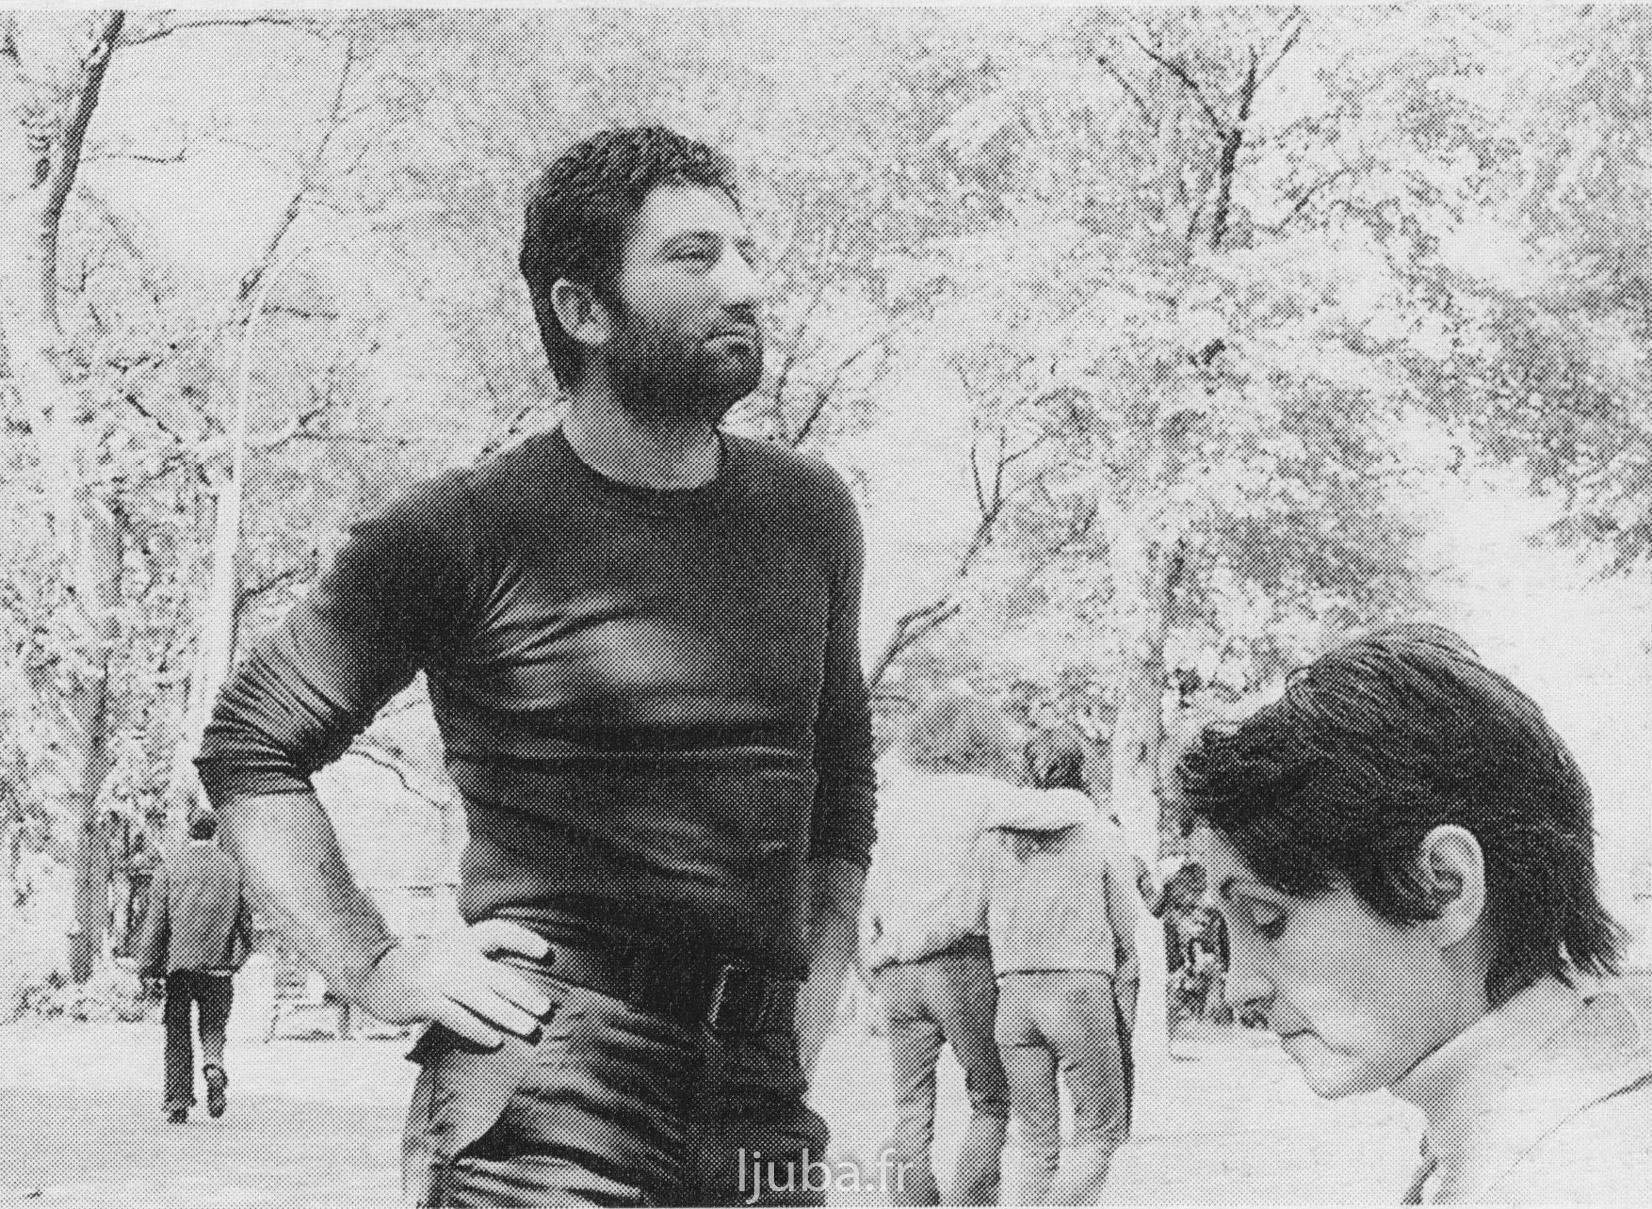 26. 1974., Ljuba i Tesa Erold, Njujork, Central park_